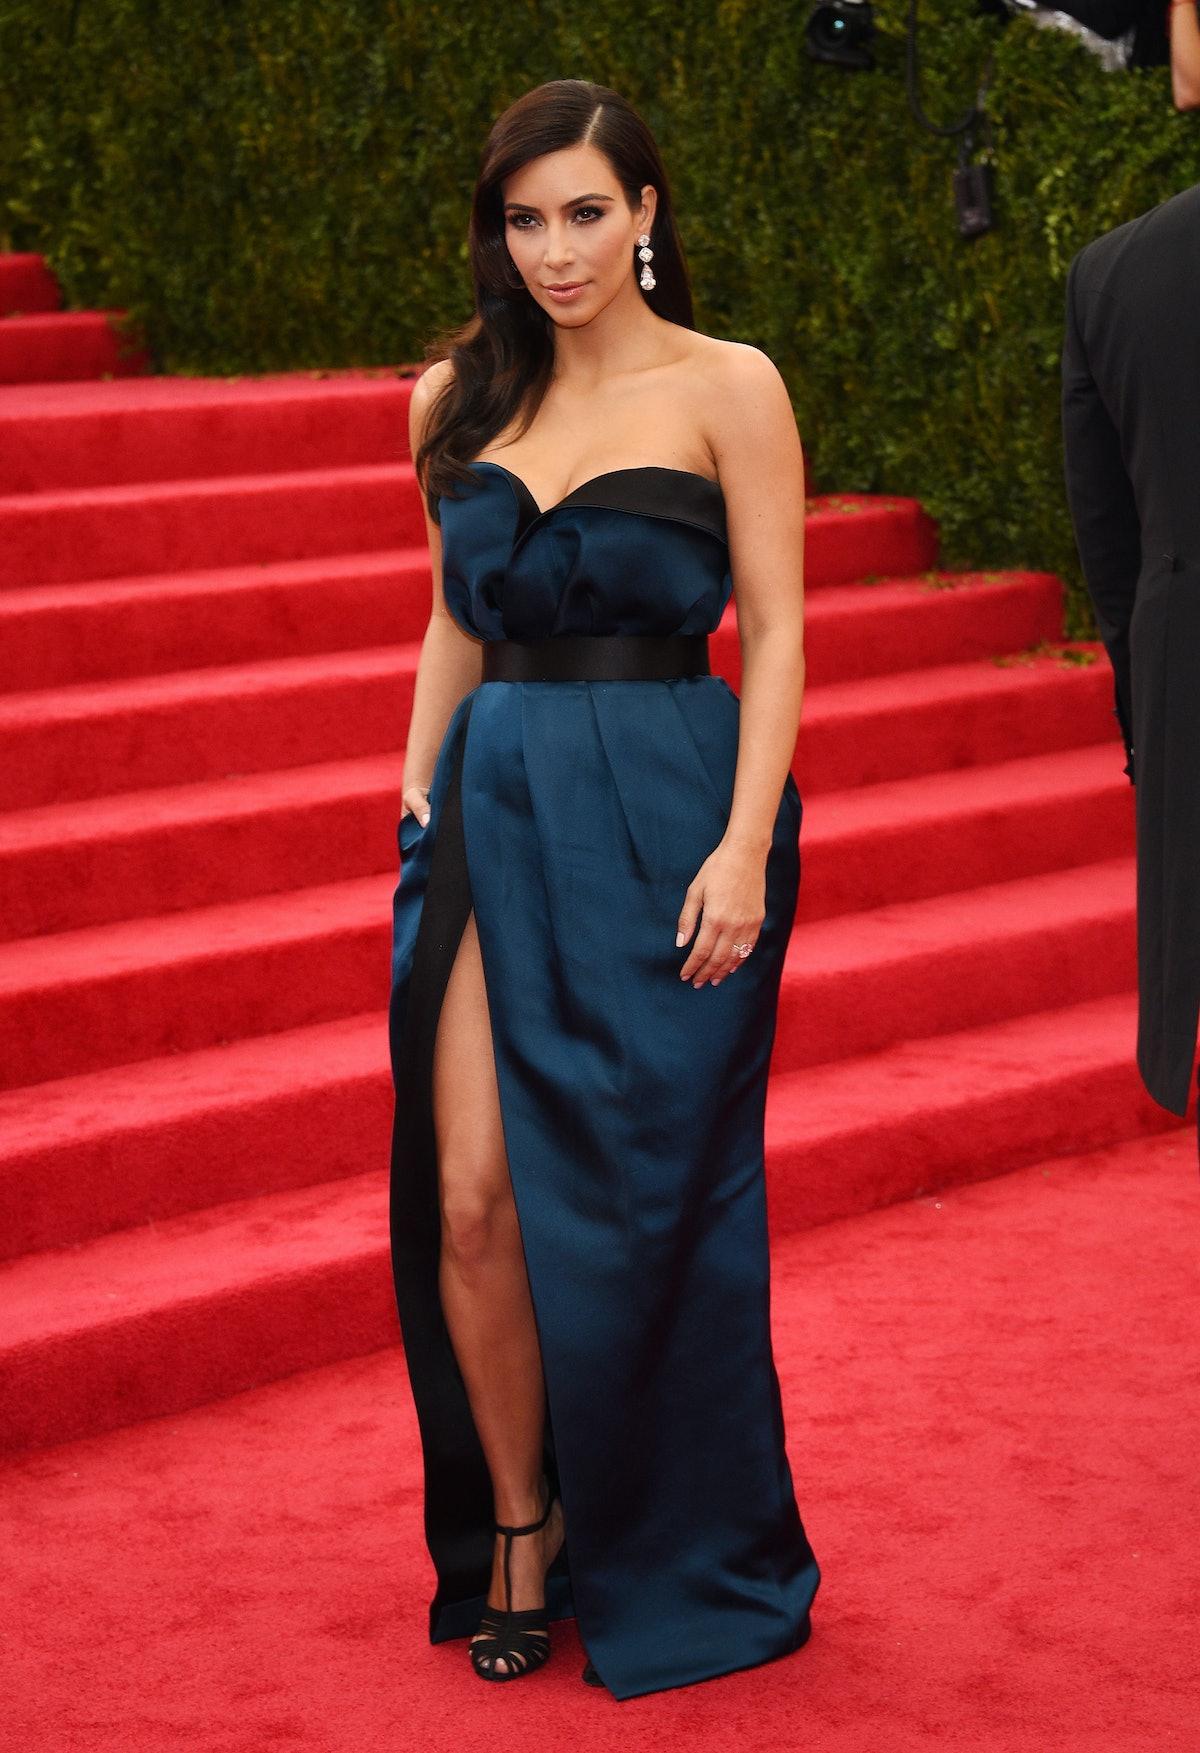 Kim Gala at the Met Gala